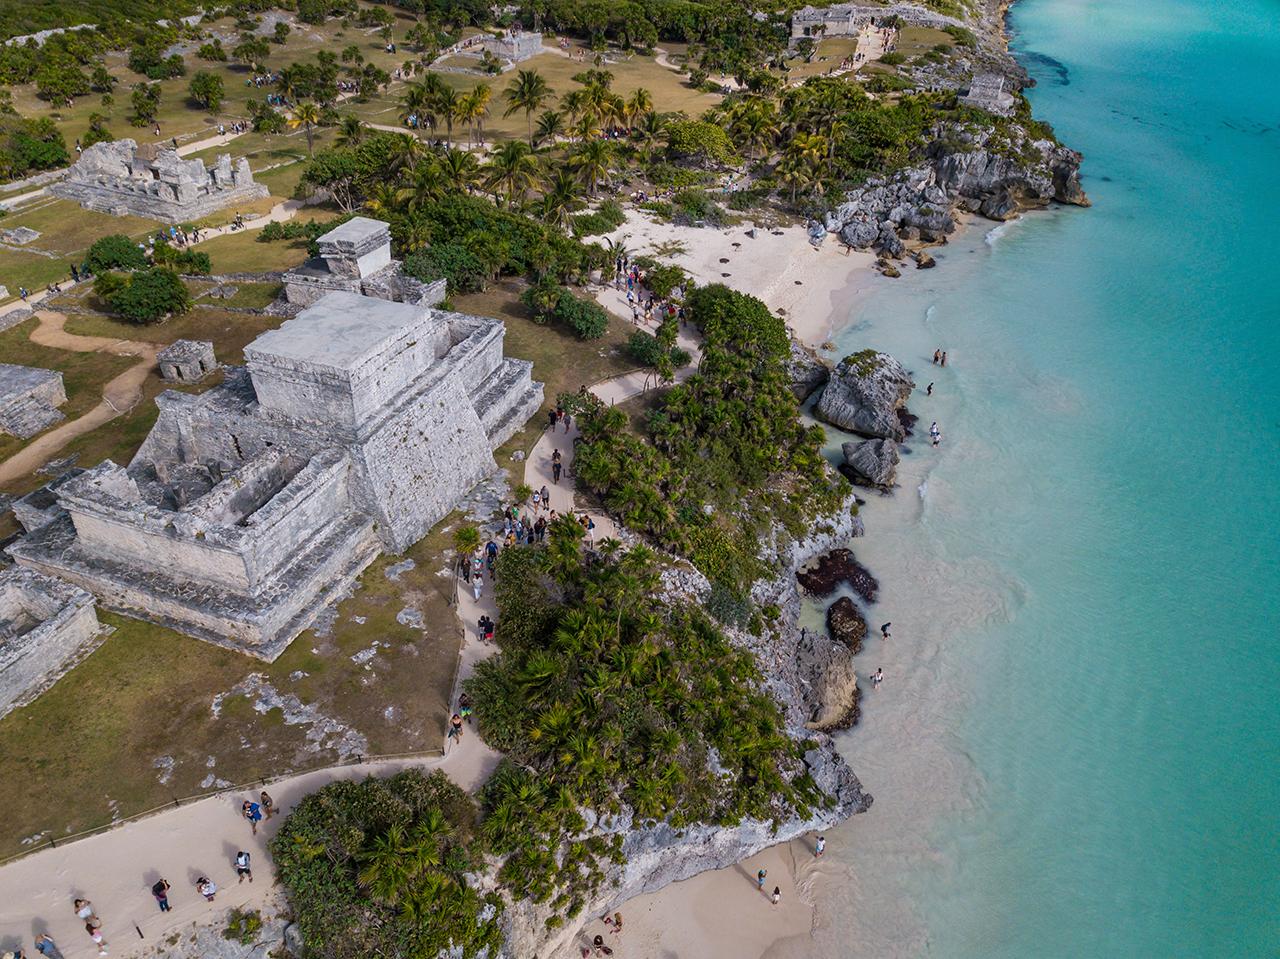 Tu patrimonio en Riviera Maya. Atrévete a vivirlo